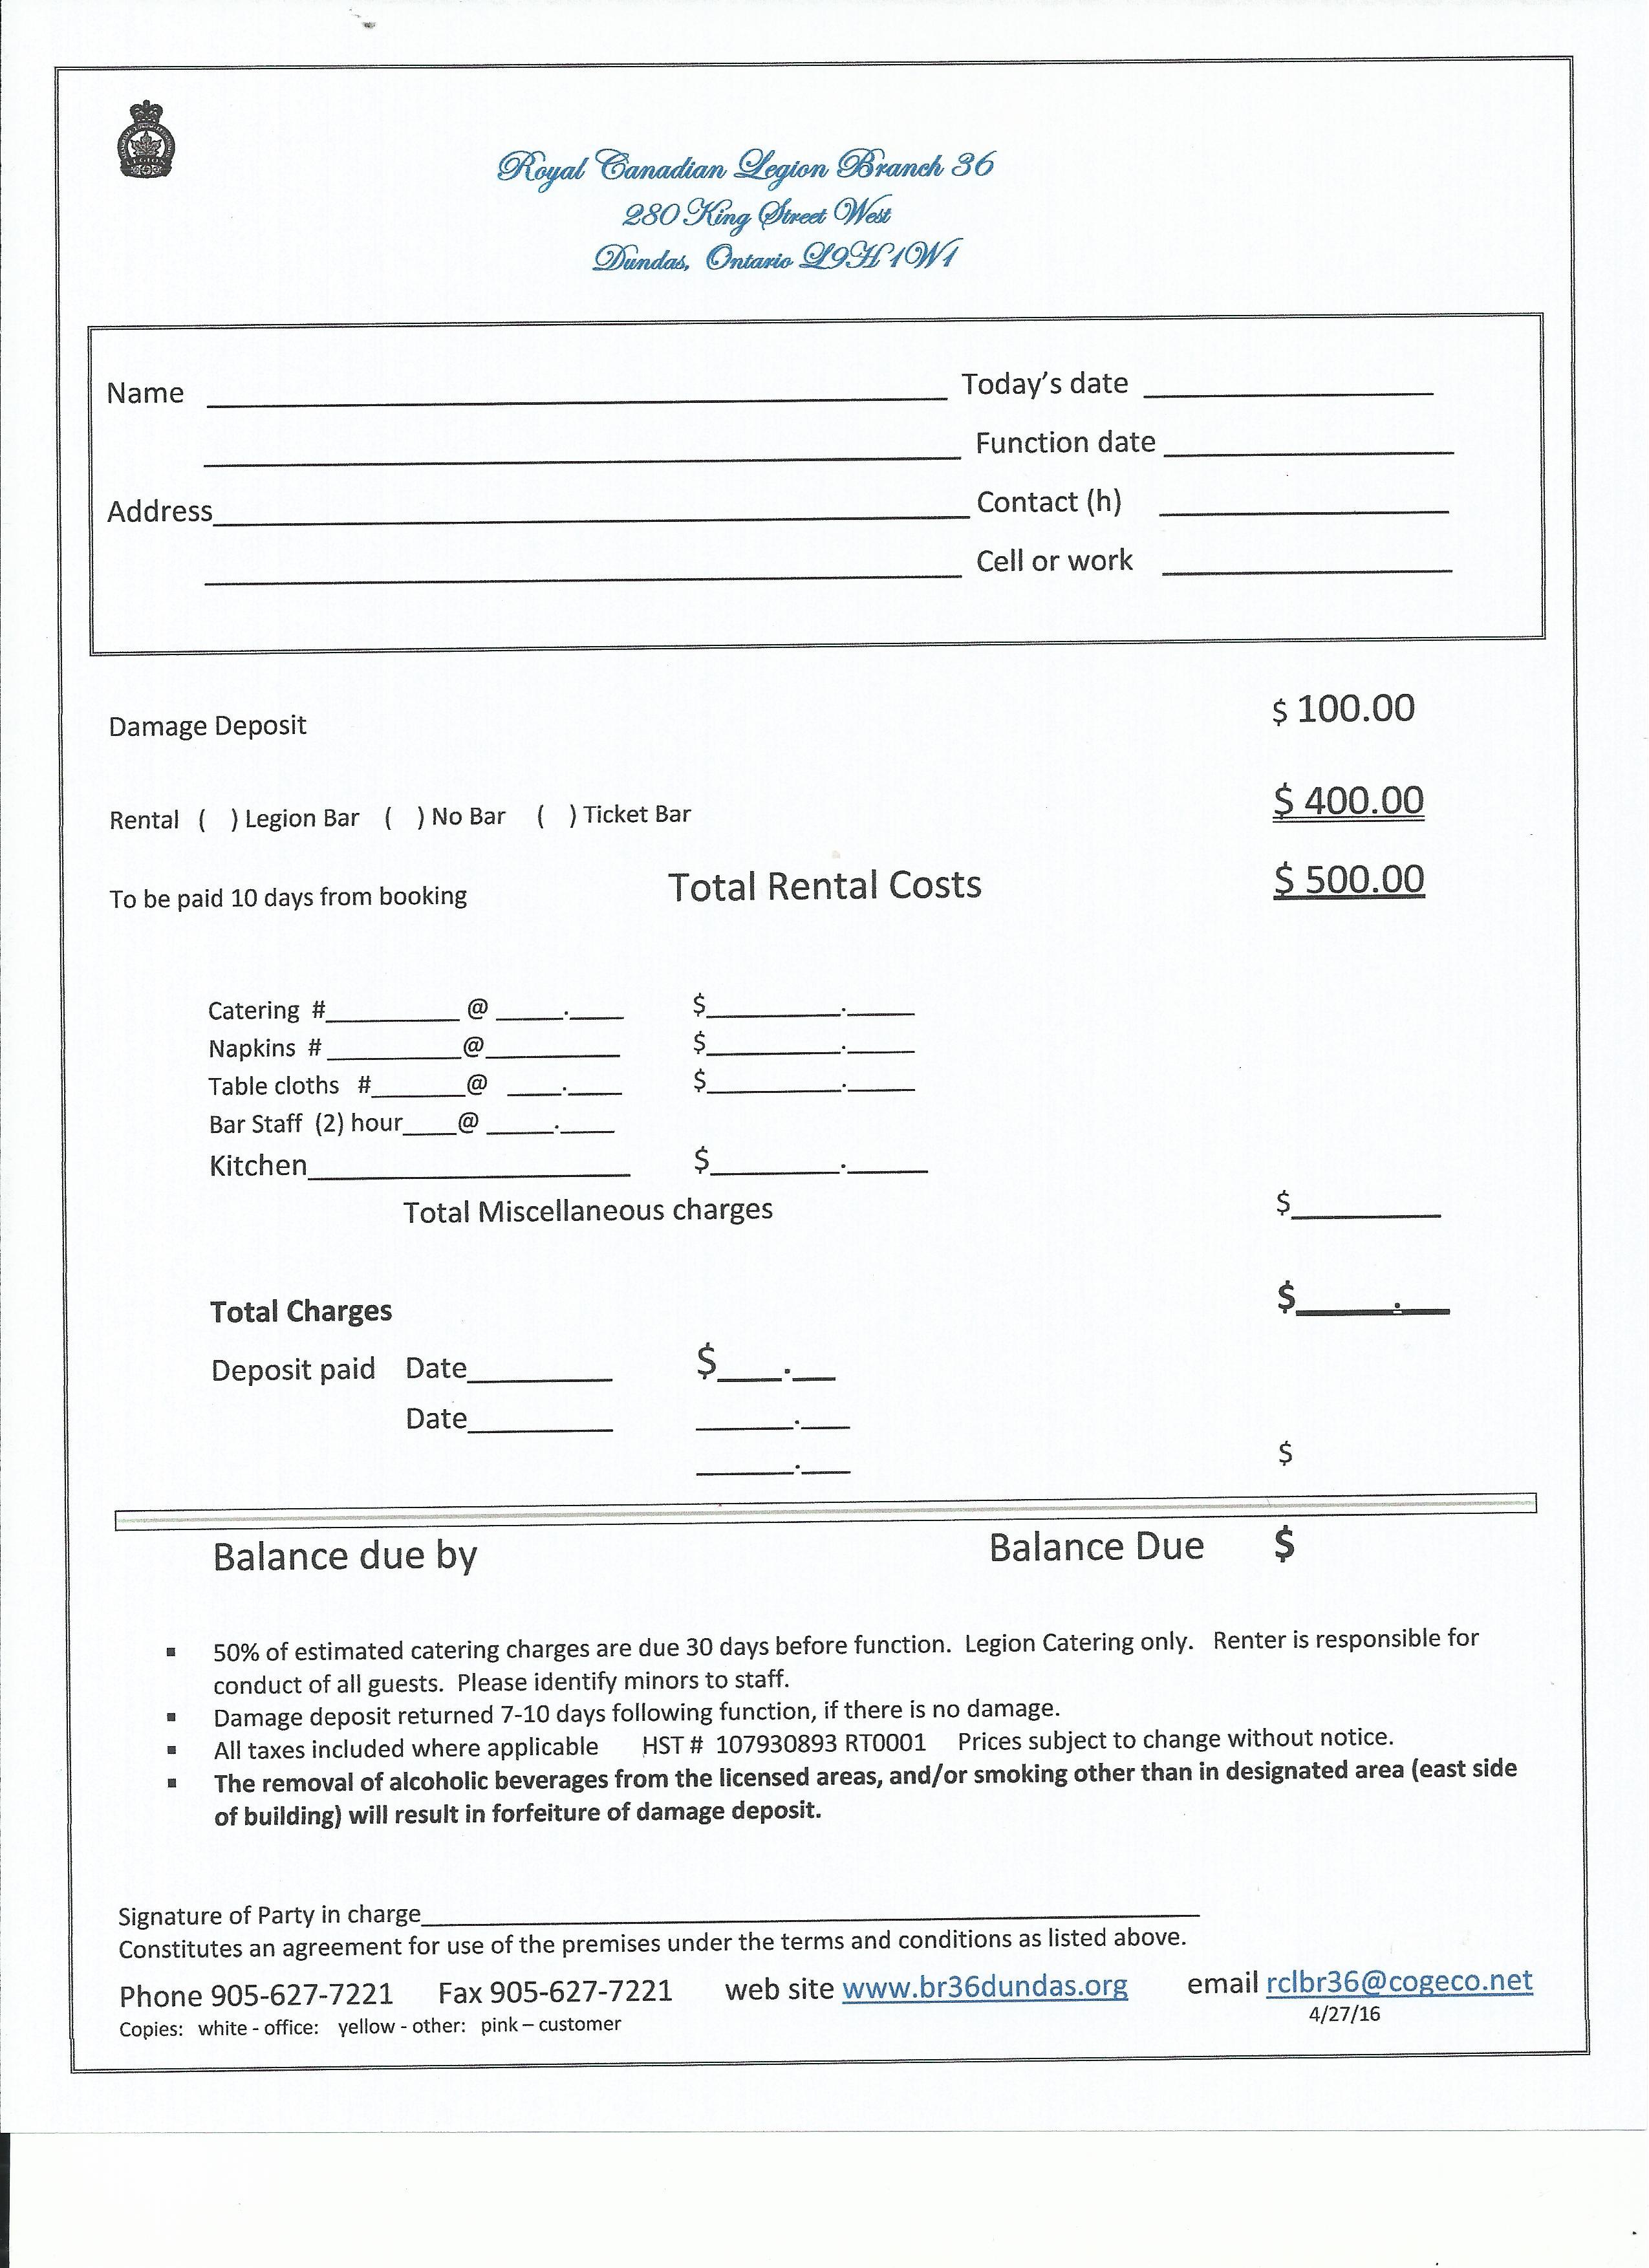 http://br36dundas.org/hallrental/bhrentalcontractform24052016.jpg